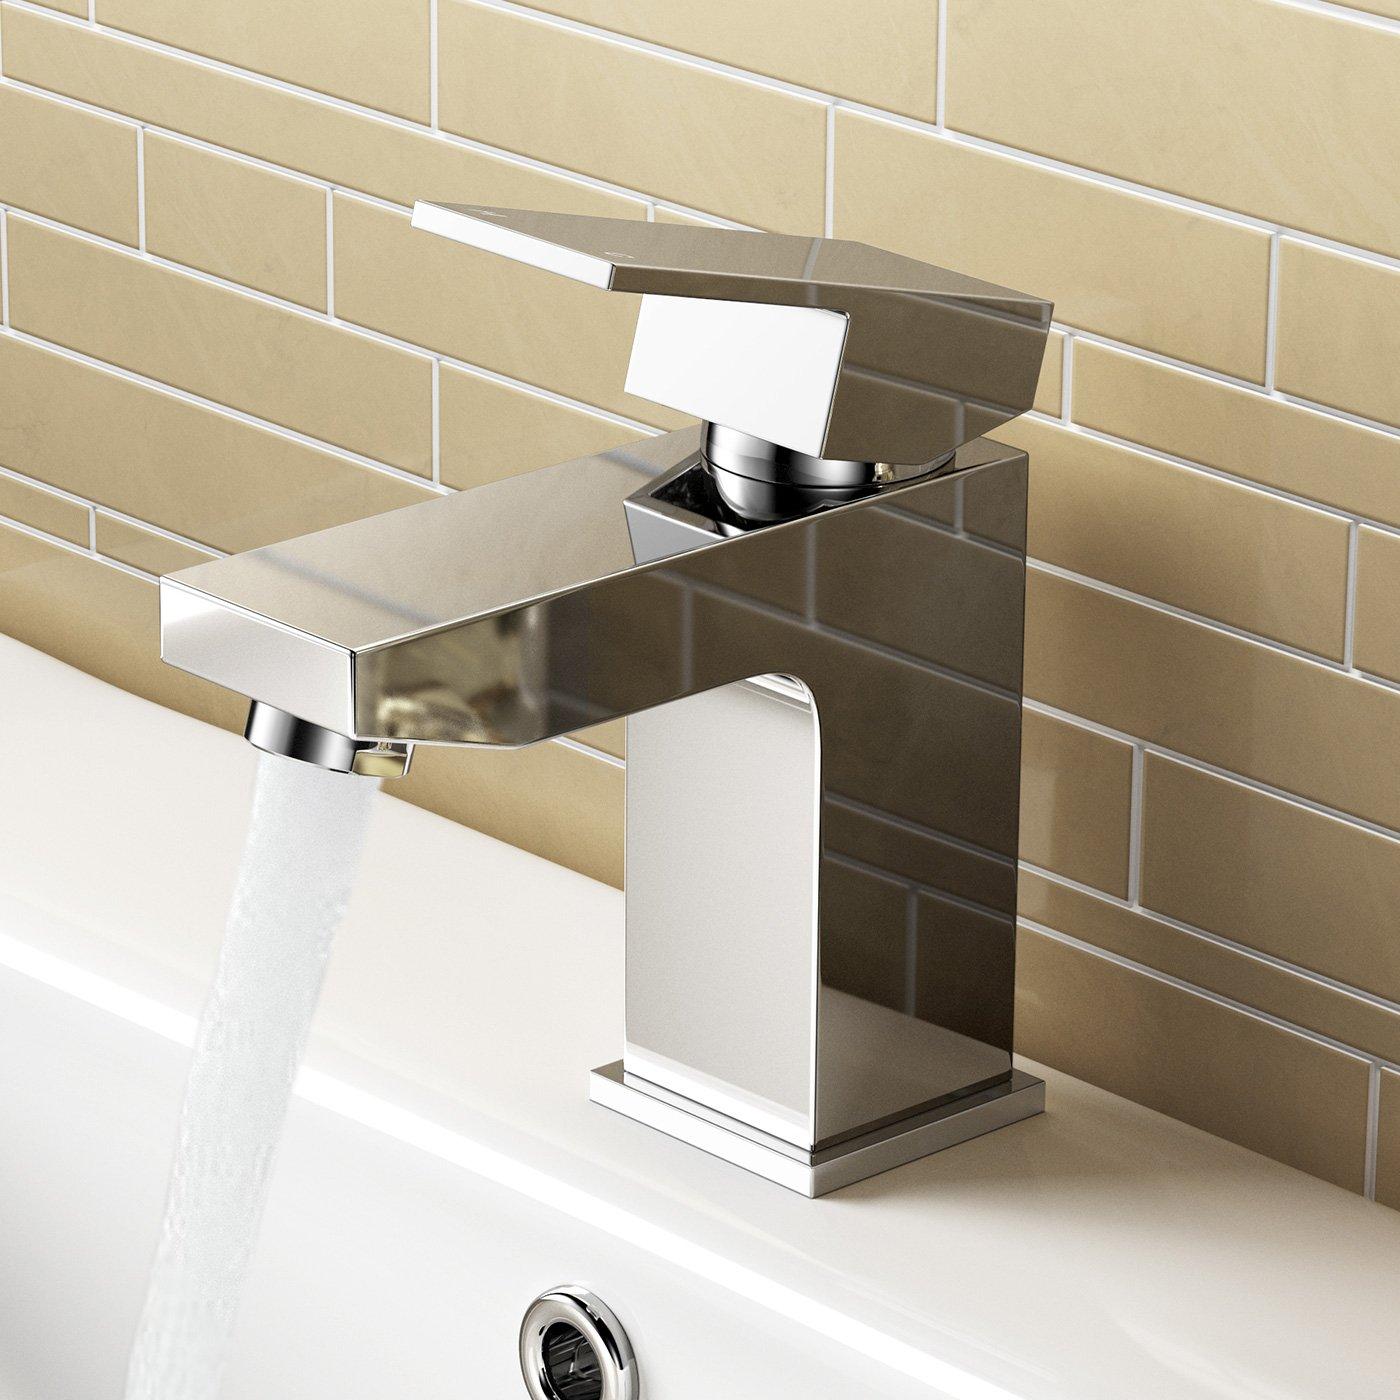 IBathUK   Chrome Basin Sink Mixer Tap + Bath Filler Bathroom Faucet Set TP32080